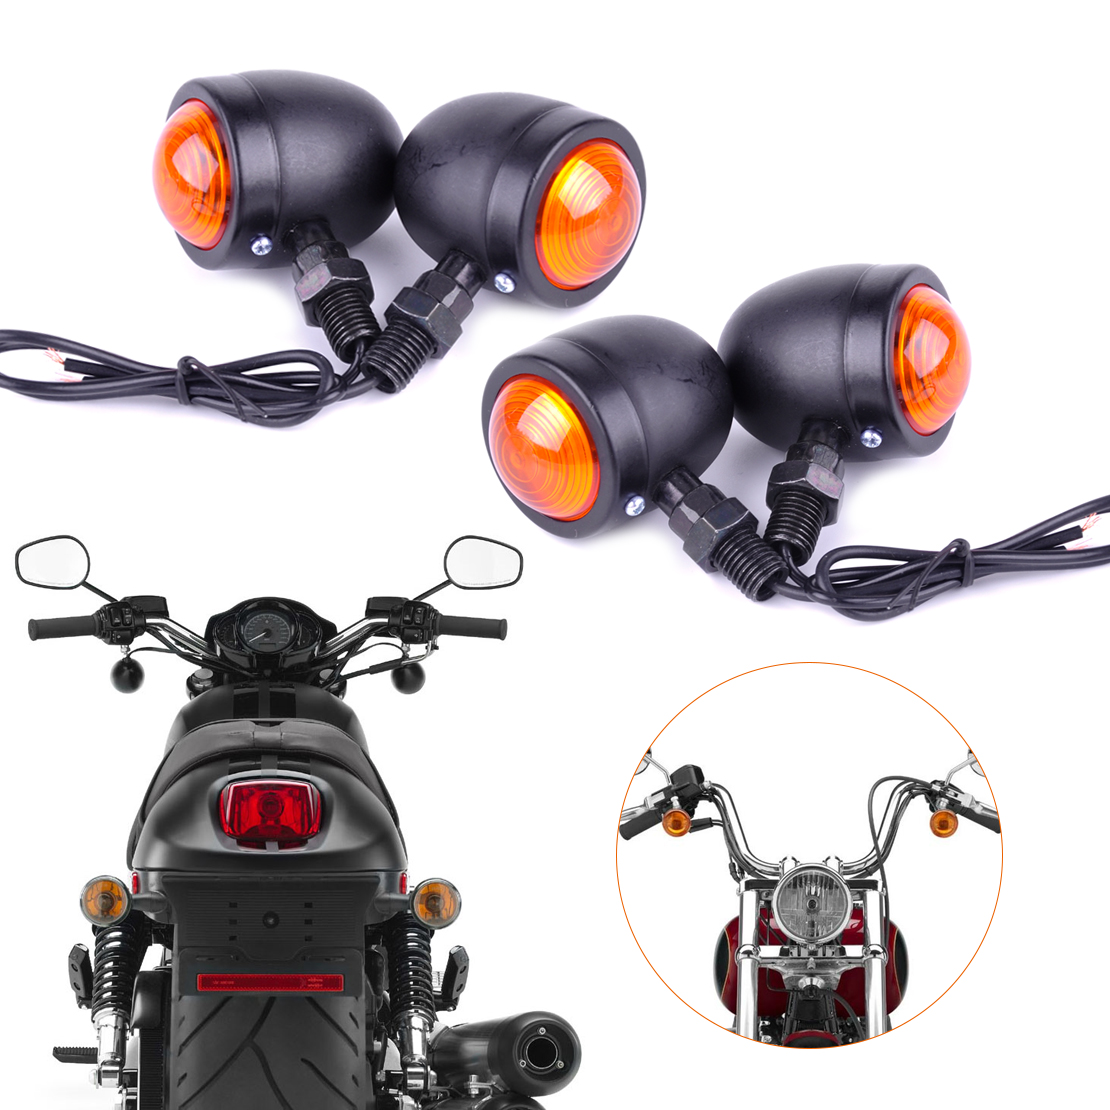 DWCX Motorrad 4x12 V Kugel Blinker Leuchtmelder Lampe Fit Fur Harley Bobber Chopper Yamaha Suzuki Kawasaki Dirt Bike